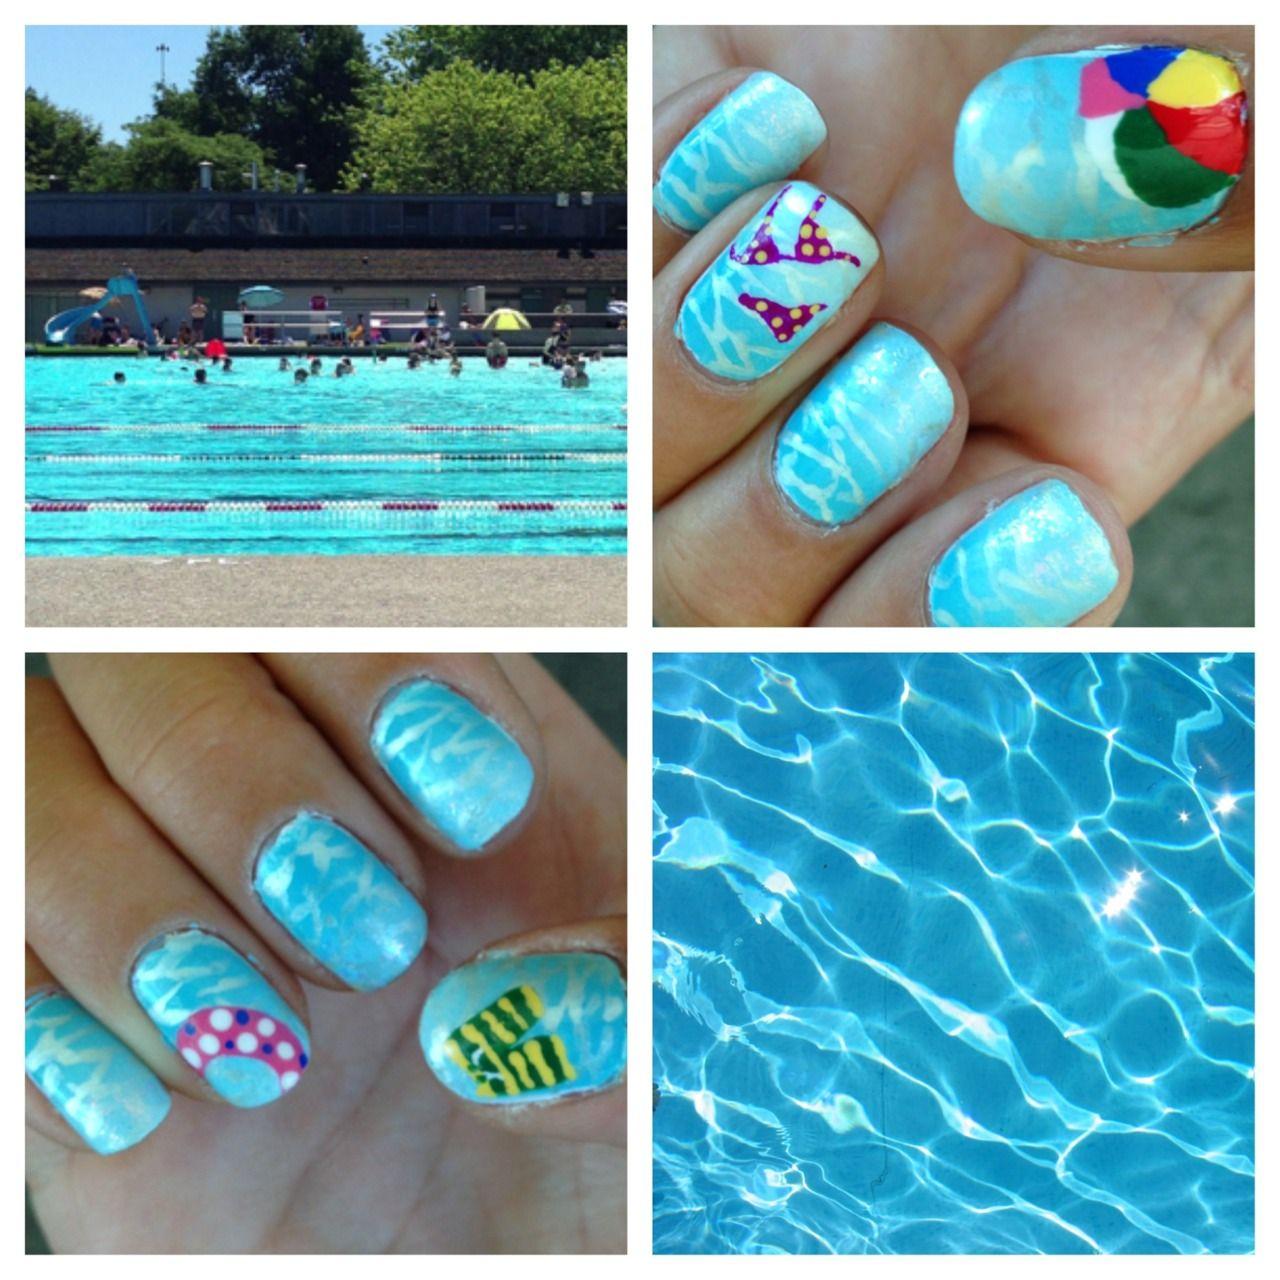 Pool Water With Beach Ball pool nails, blue ombre water nail art. bikini, beach-ball, shorts